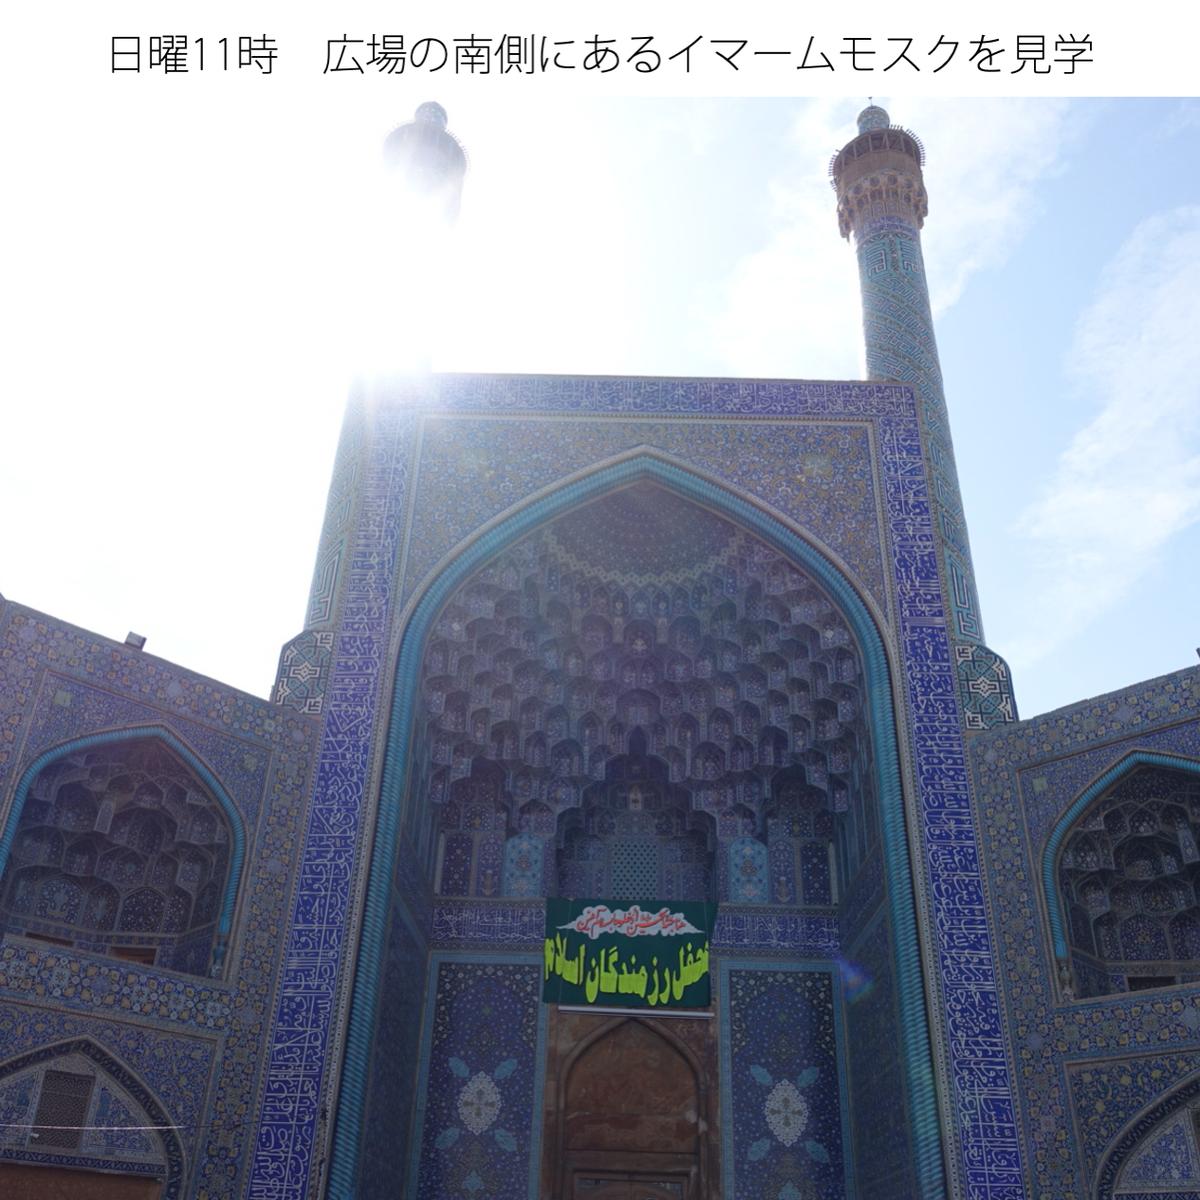 f:id:tomatsu1024:20210819173912p:plain